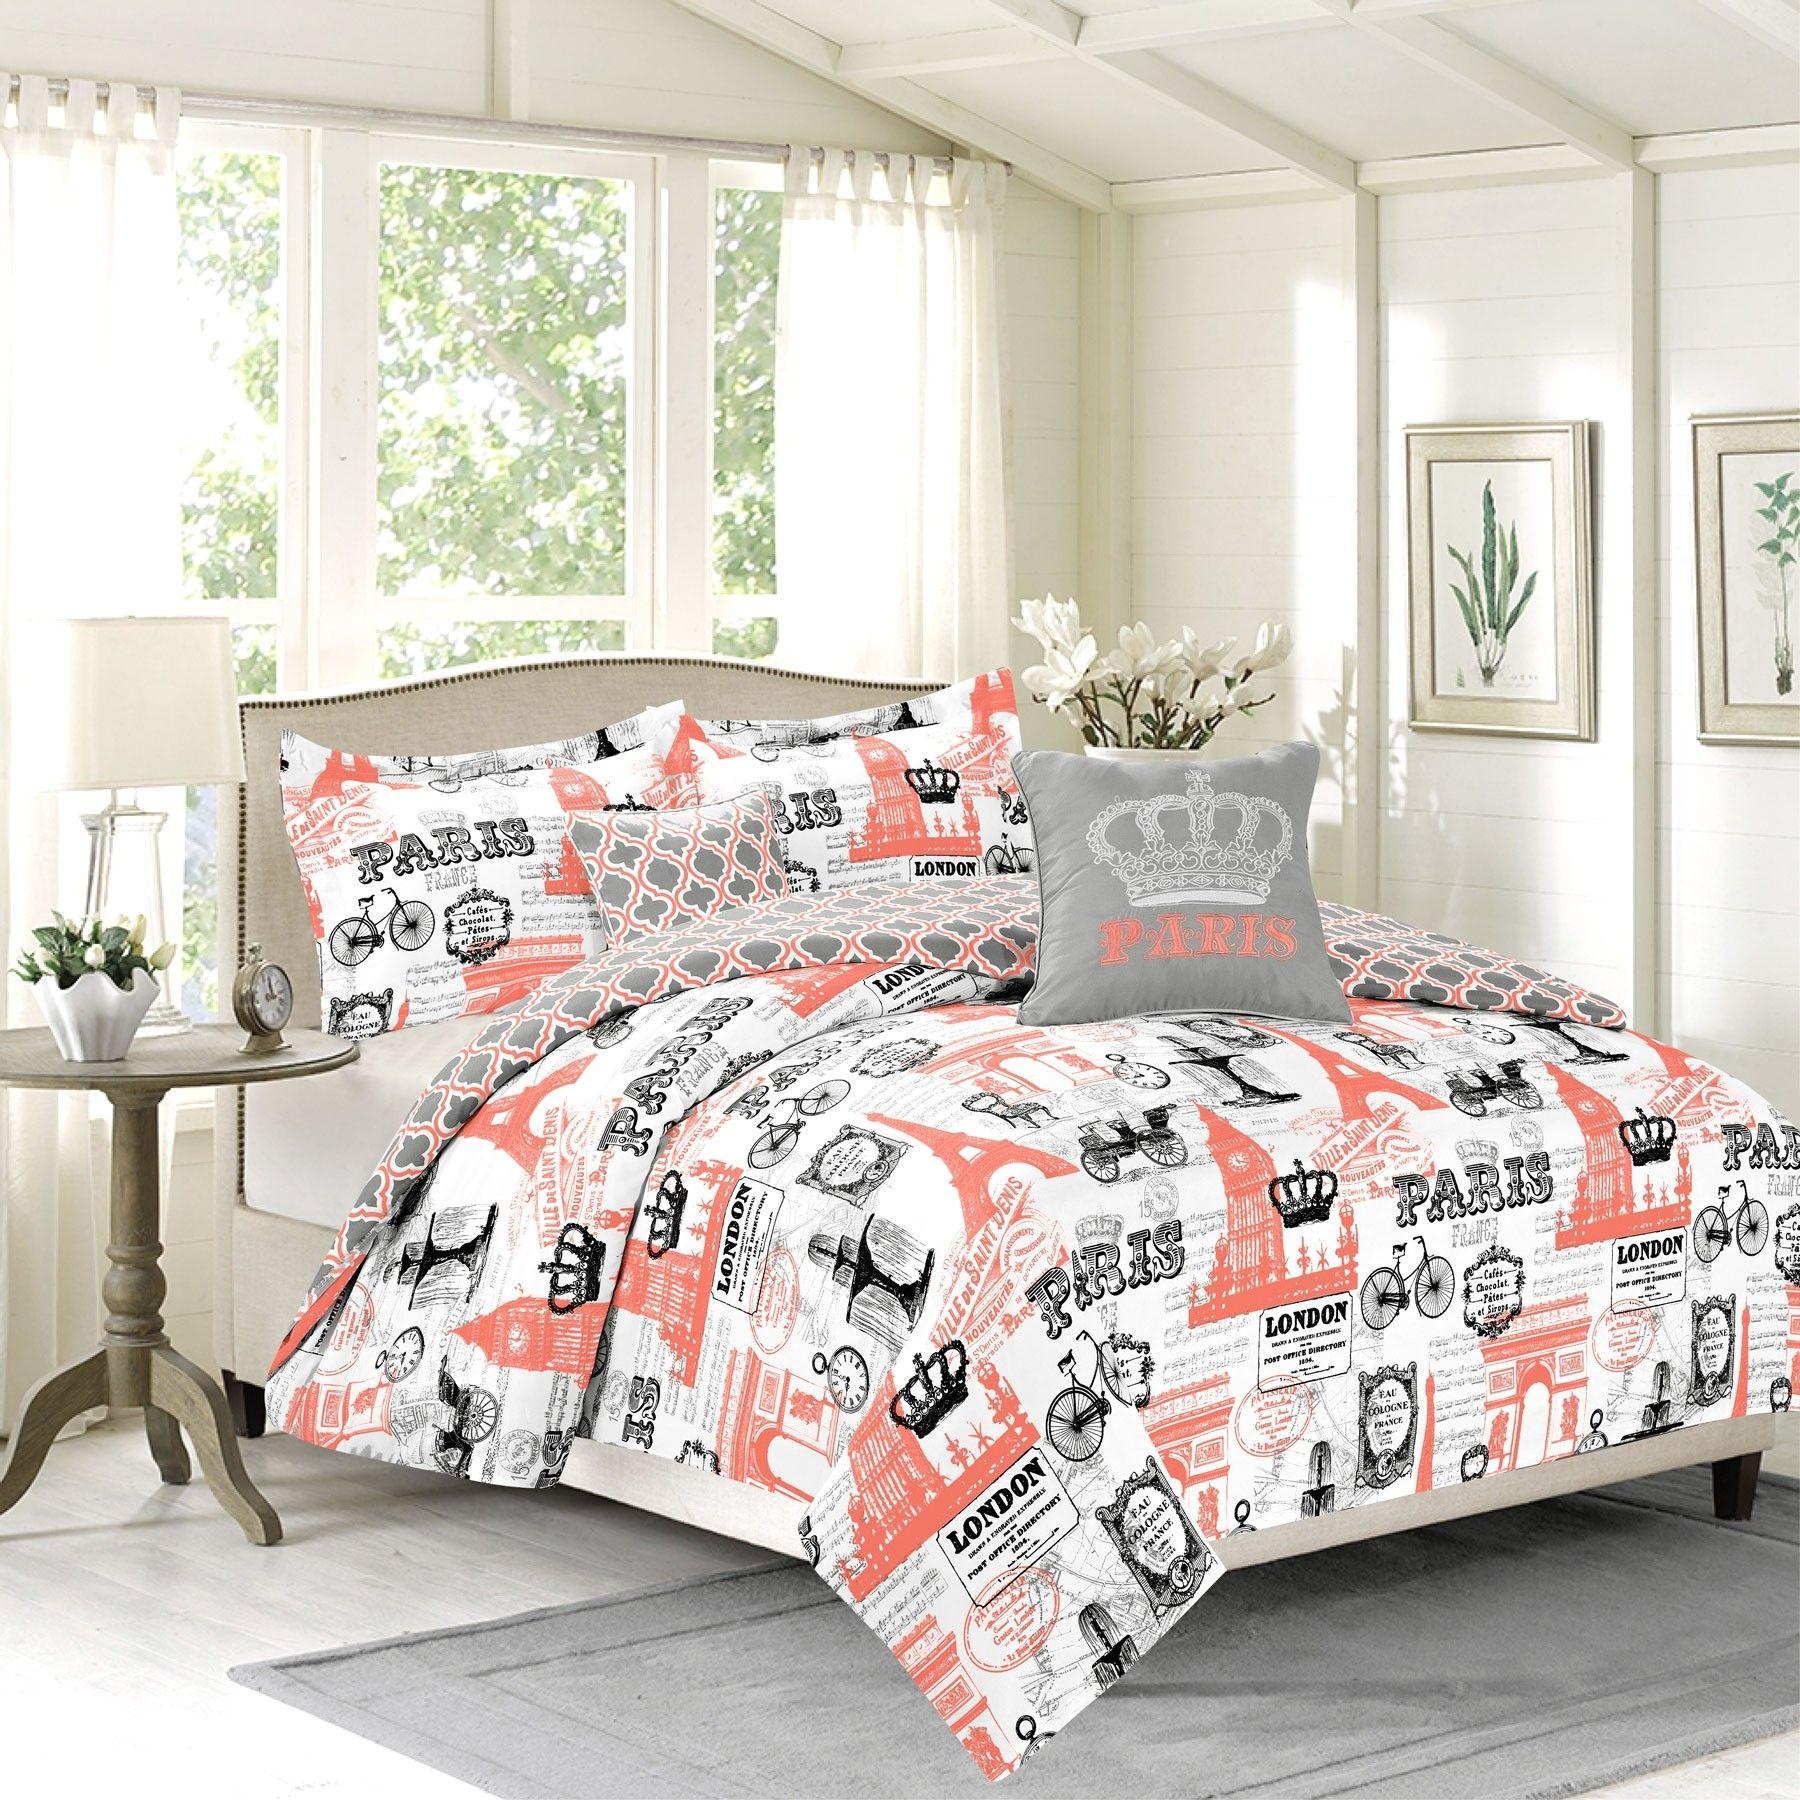 Crest Home Bon Voyage Bedding Queen 5 Piece Comforter Bed Set, Paris Eiffel  Tower London